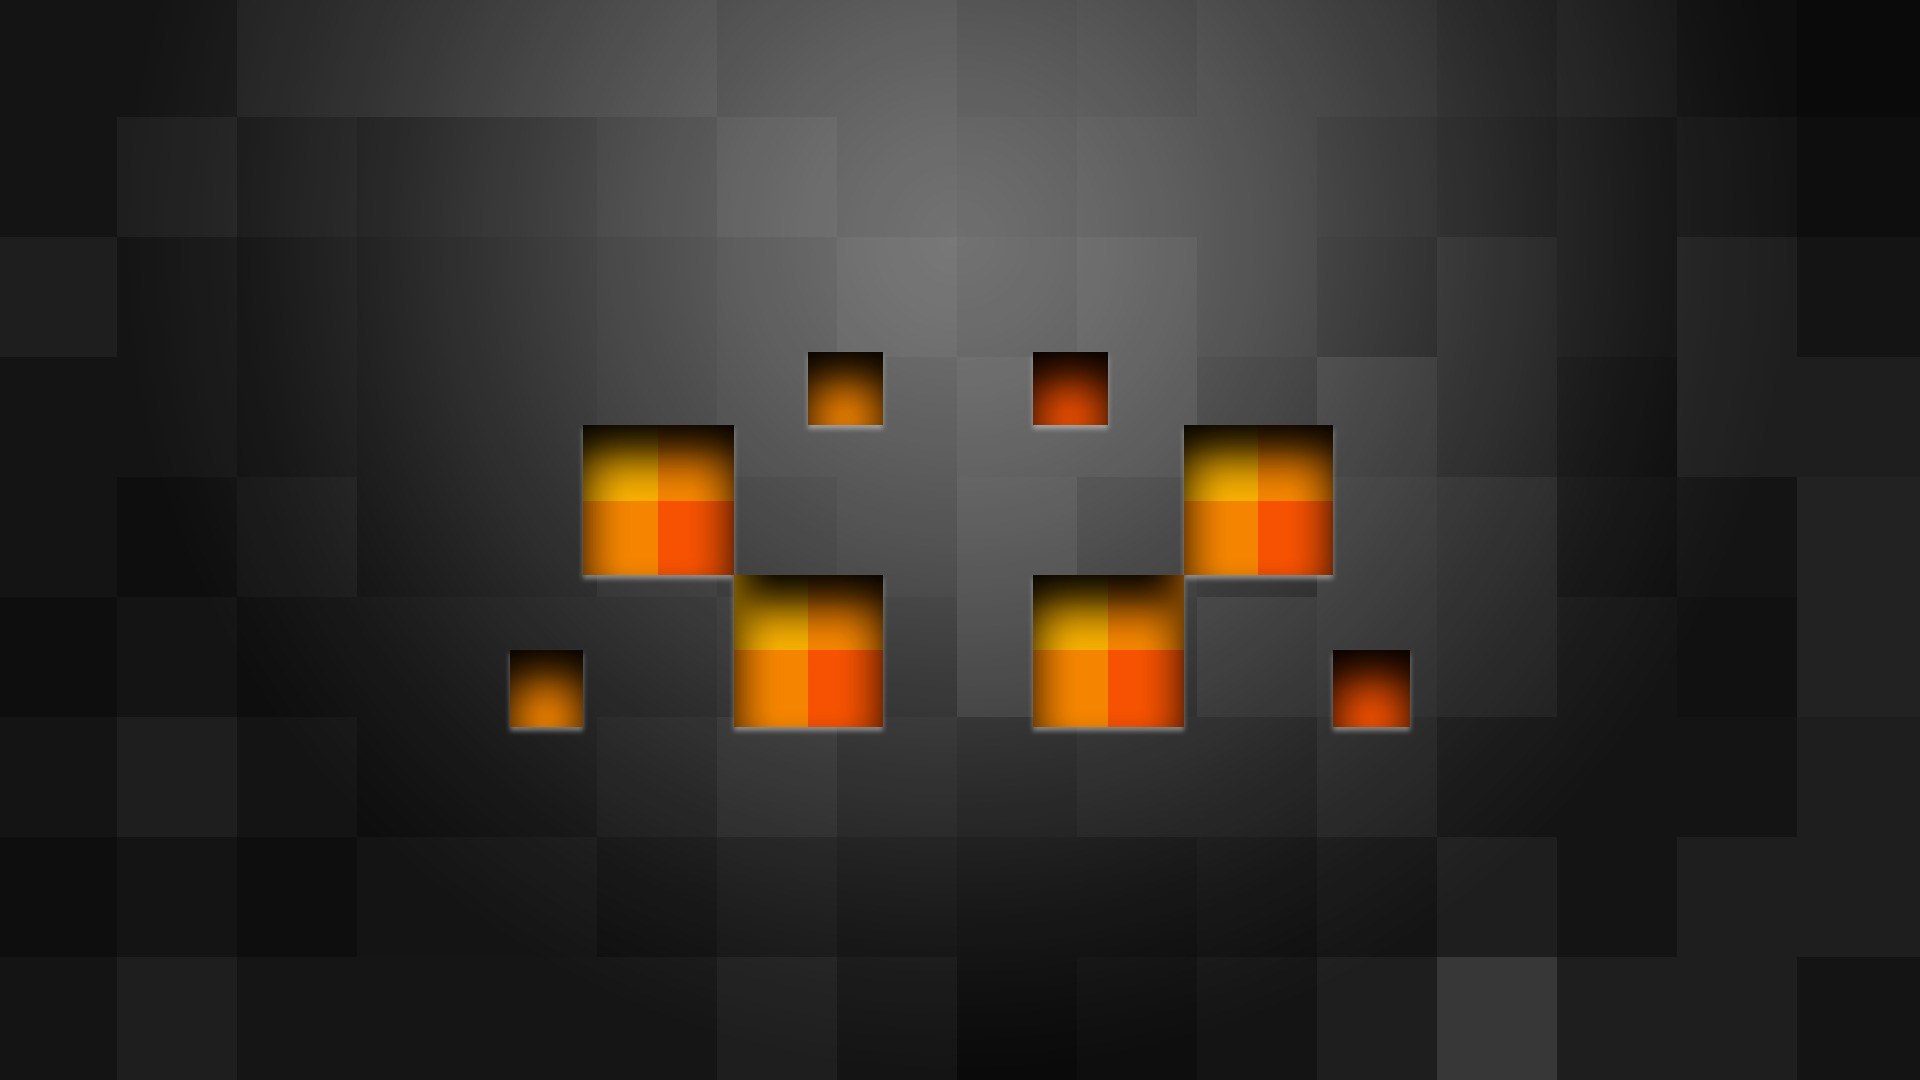 Fnatic Wallpaper Iphone Minecraft Wallpaper Maker Pixelstalk Net